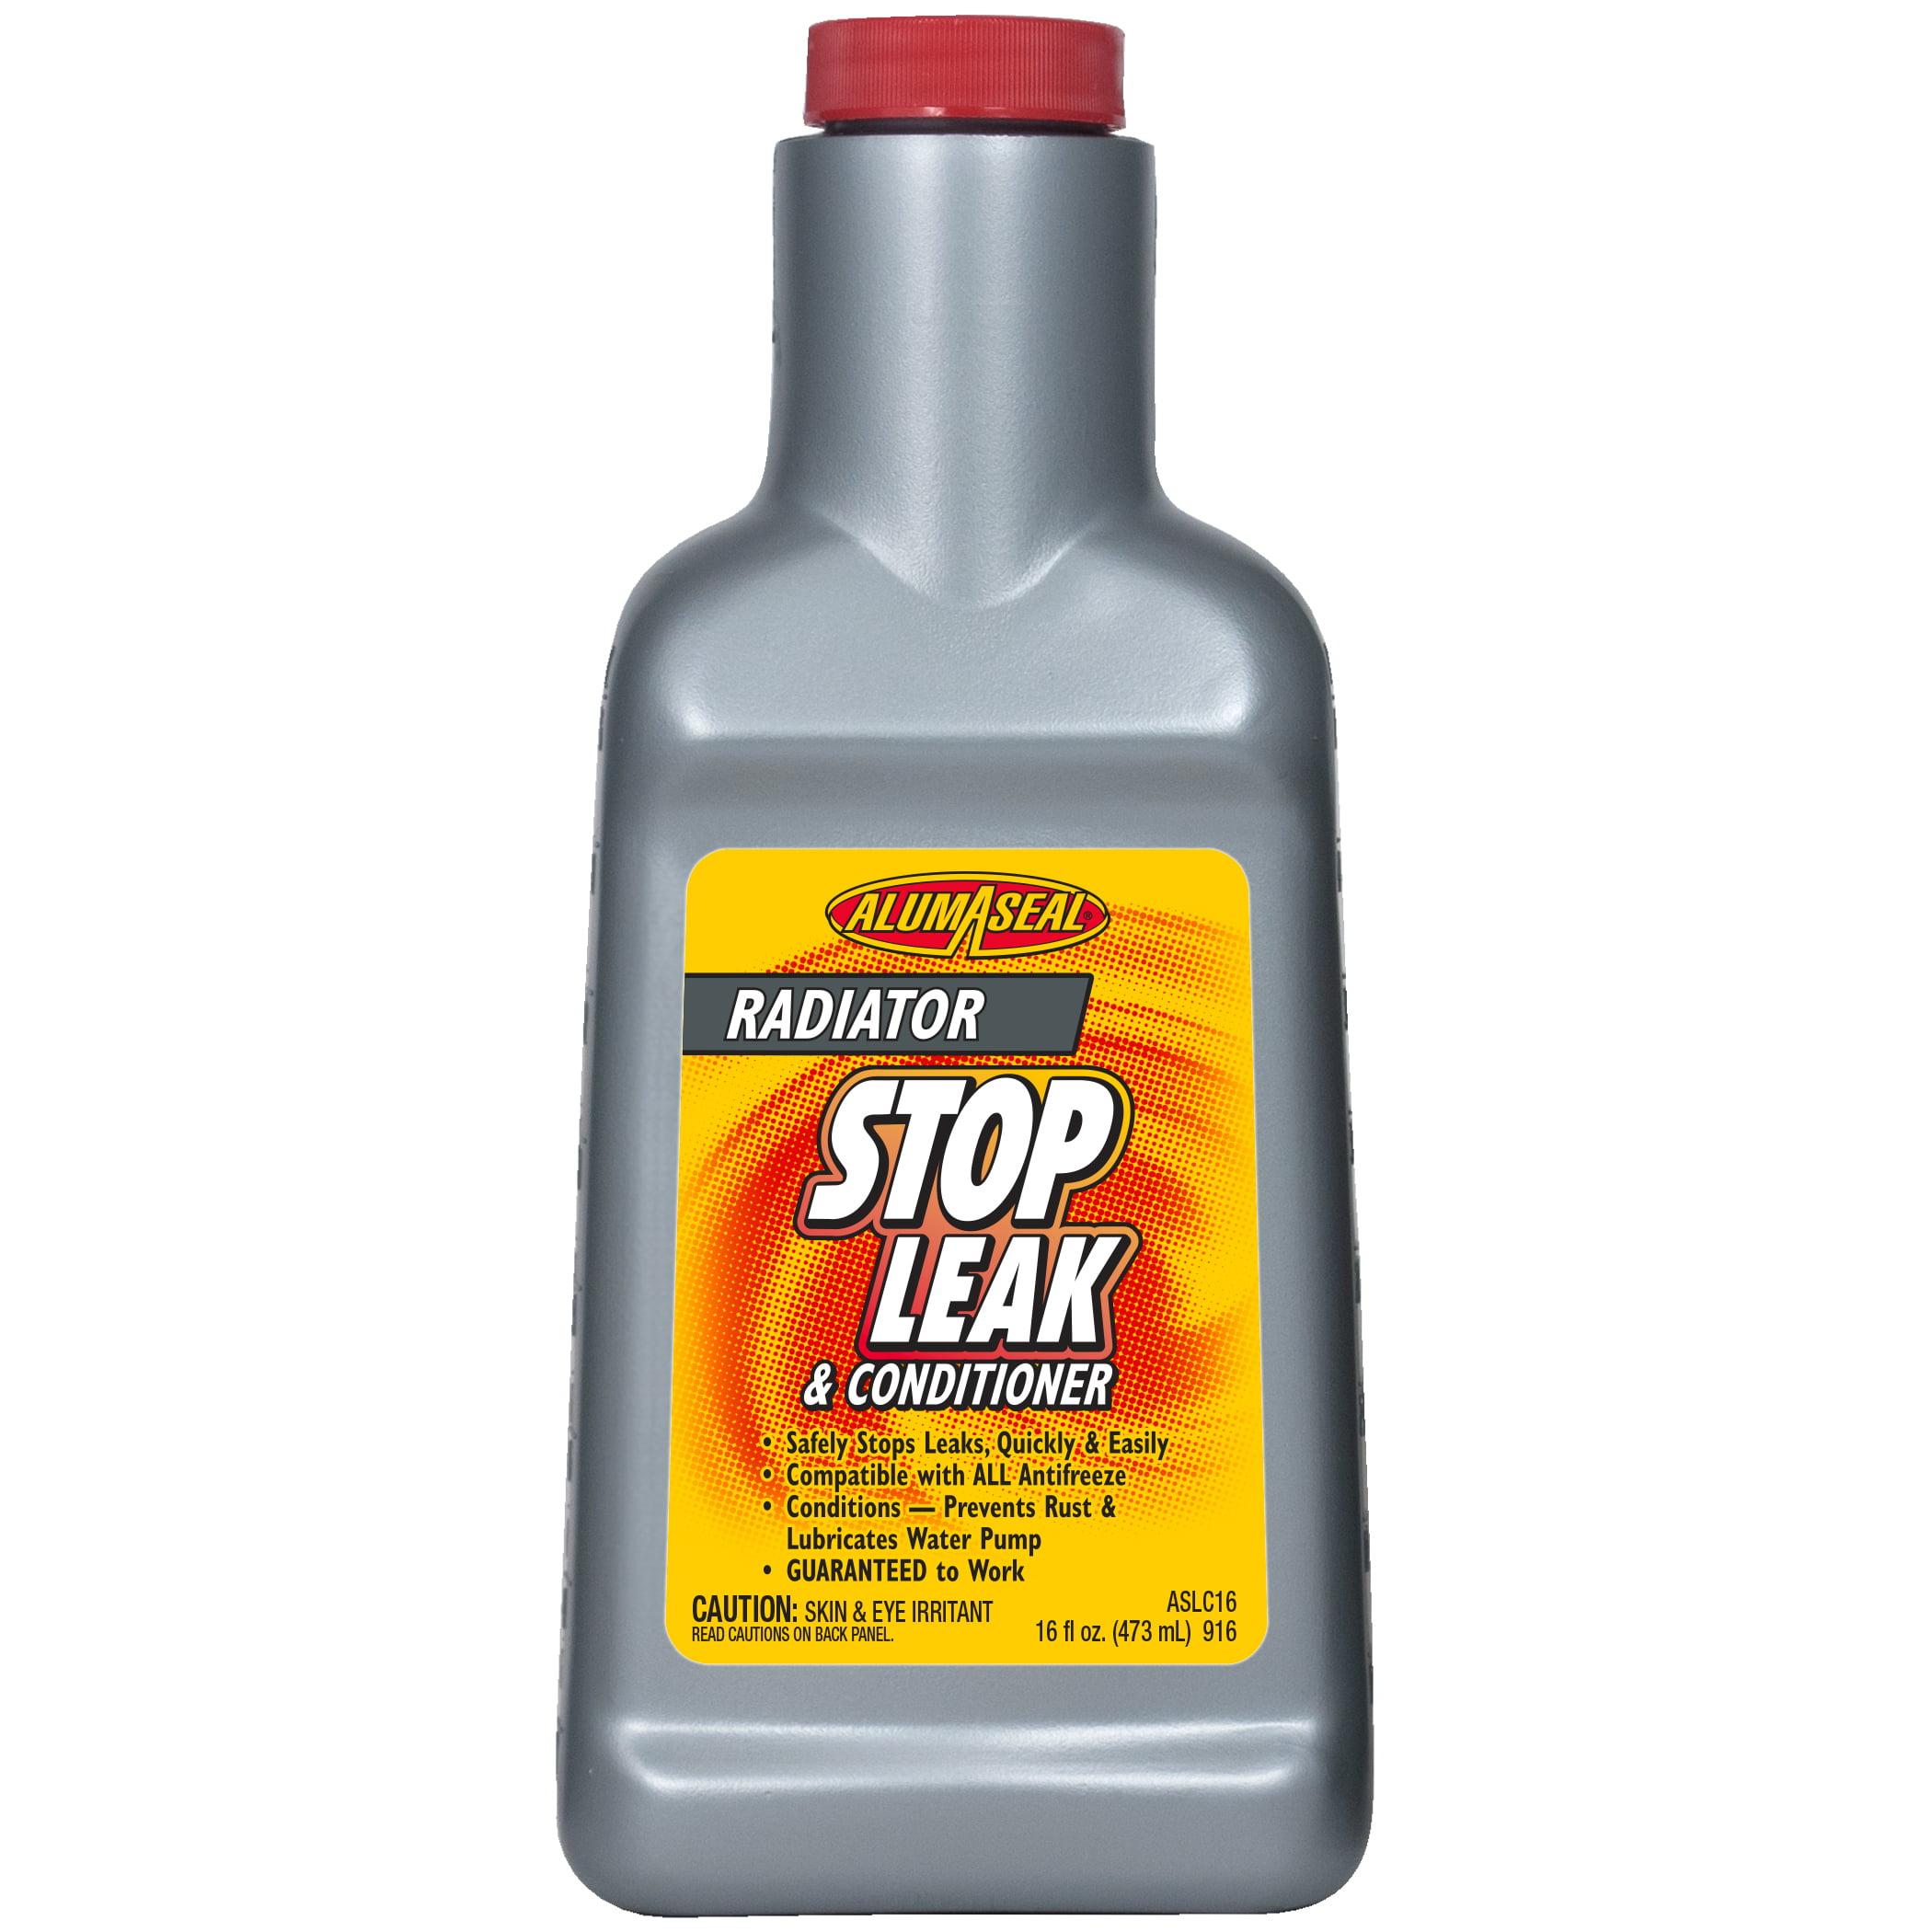 ALUMASEAL (ASLC16) Radiator Sealer Liquid, 16 oz by Alumaseal